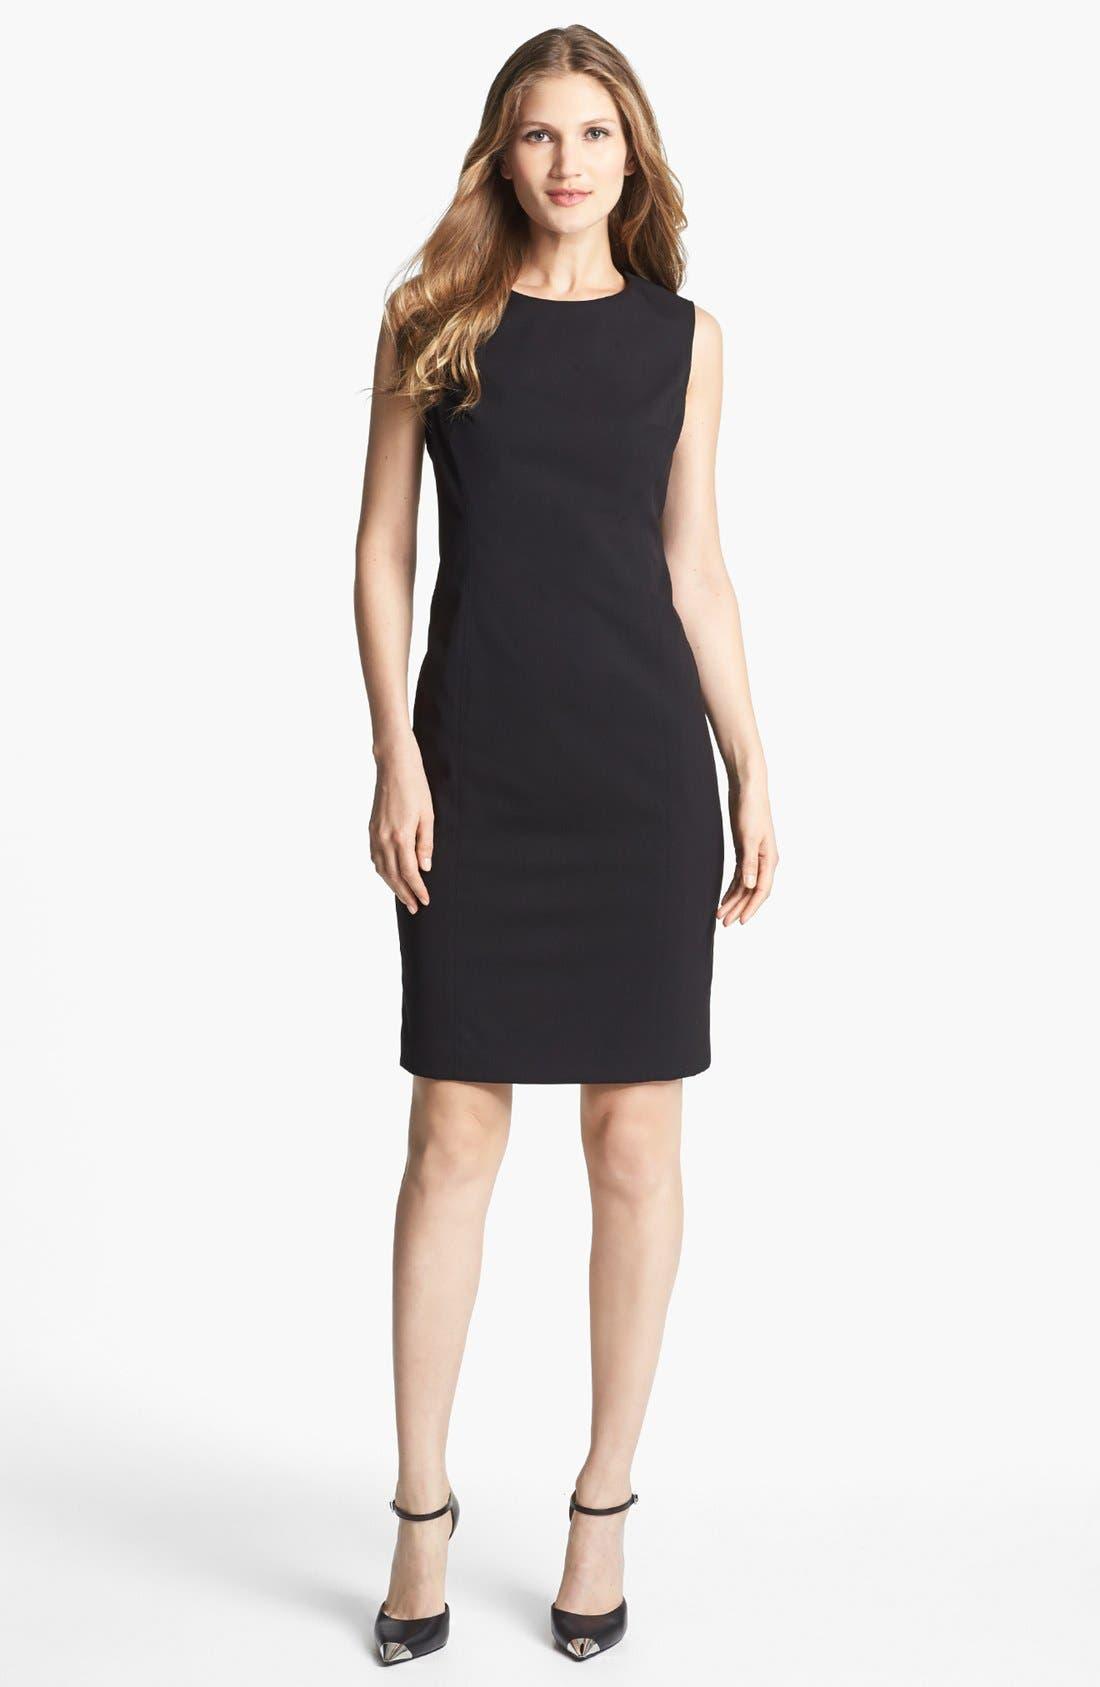 Alternate Image 1 Selected - Jones New York 'Mallory' All Season Stretch Sheath Dress